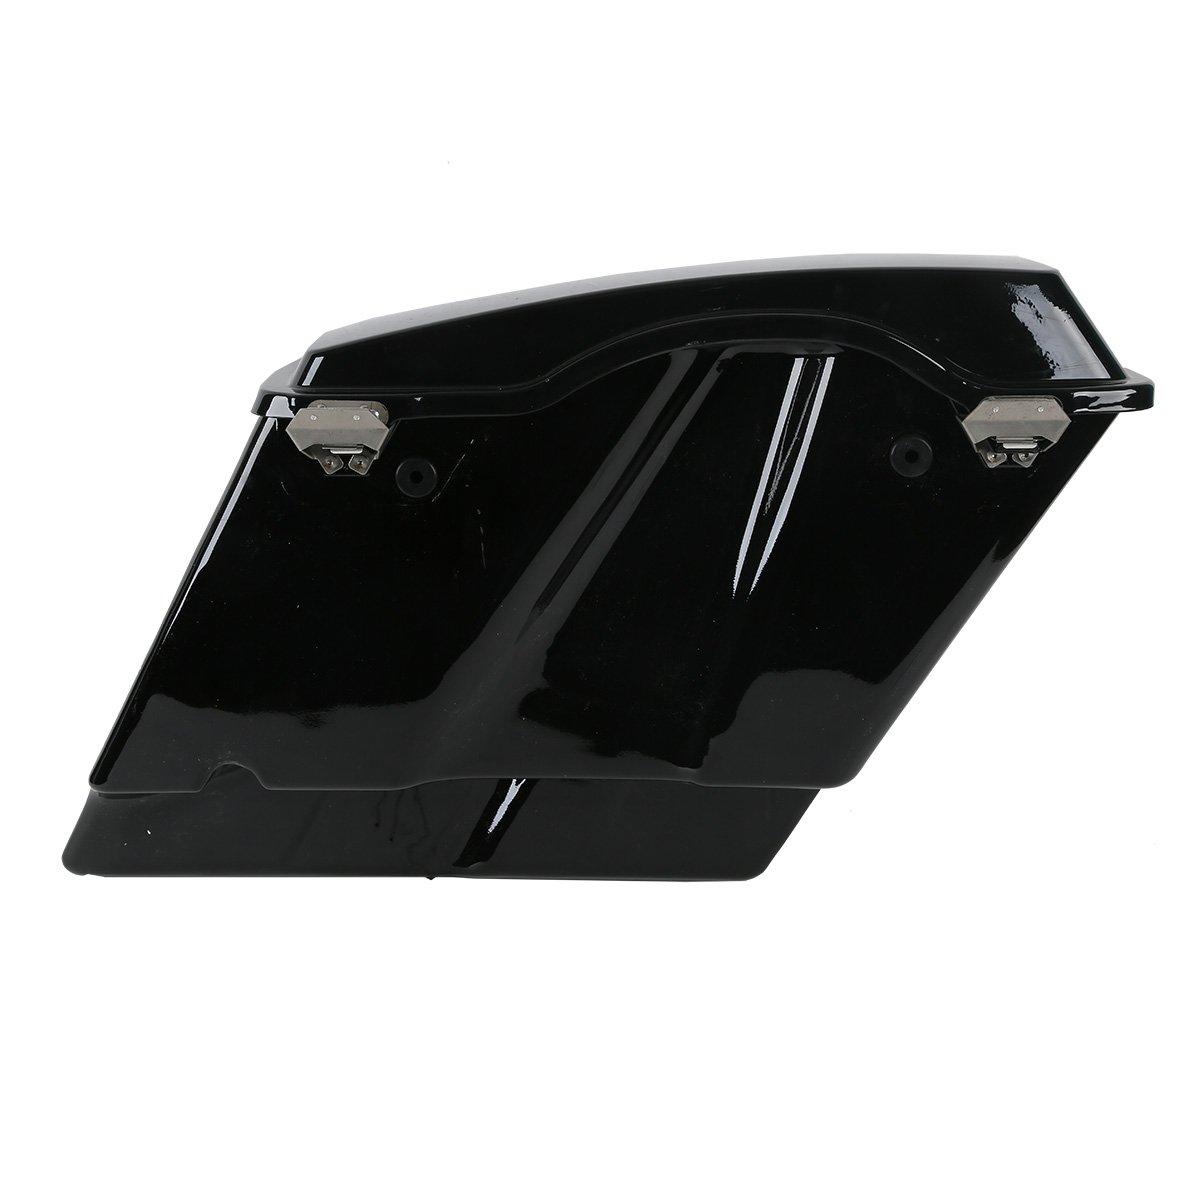 Hard Saddlebags for Electra Glide Road King Street Glide Touring 1993-2013 5 Vivid Black Stretched Extended